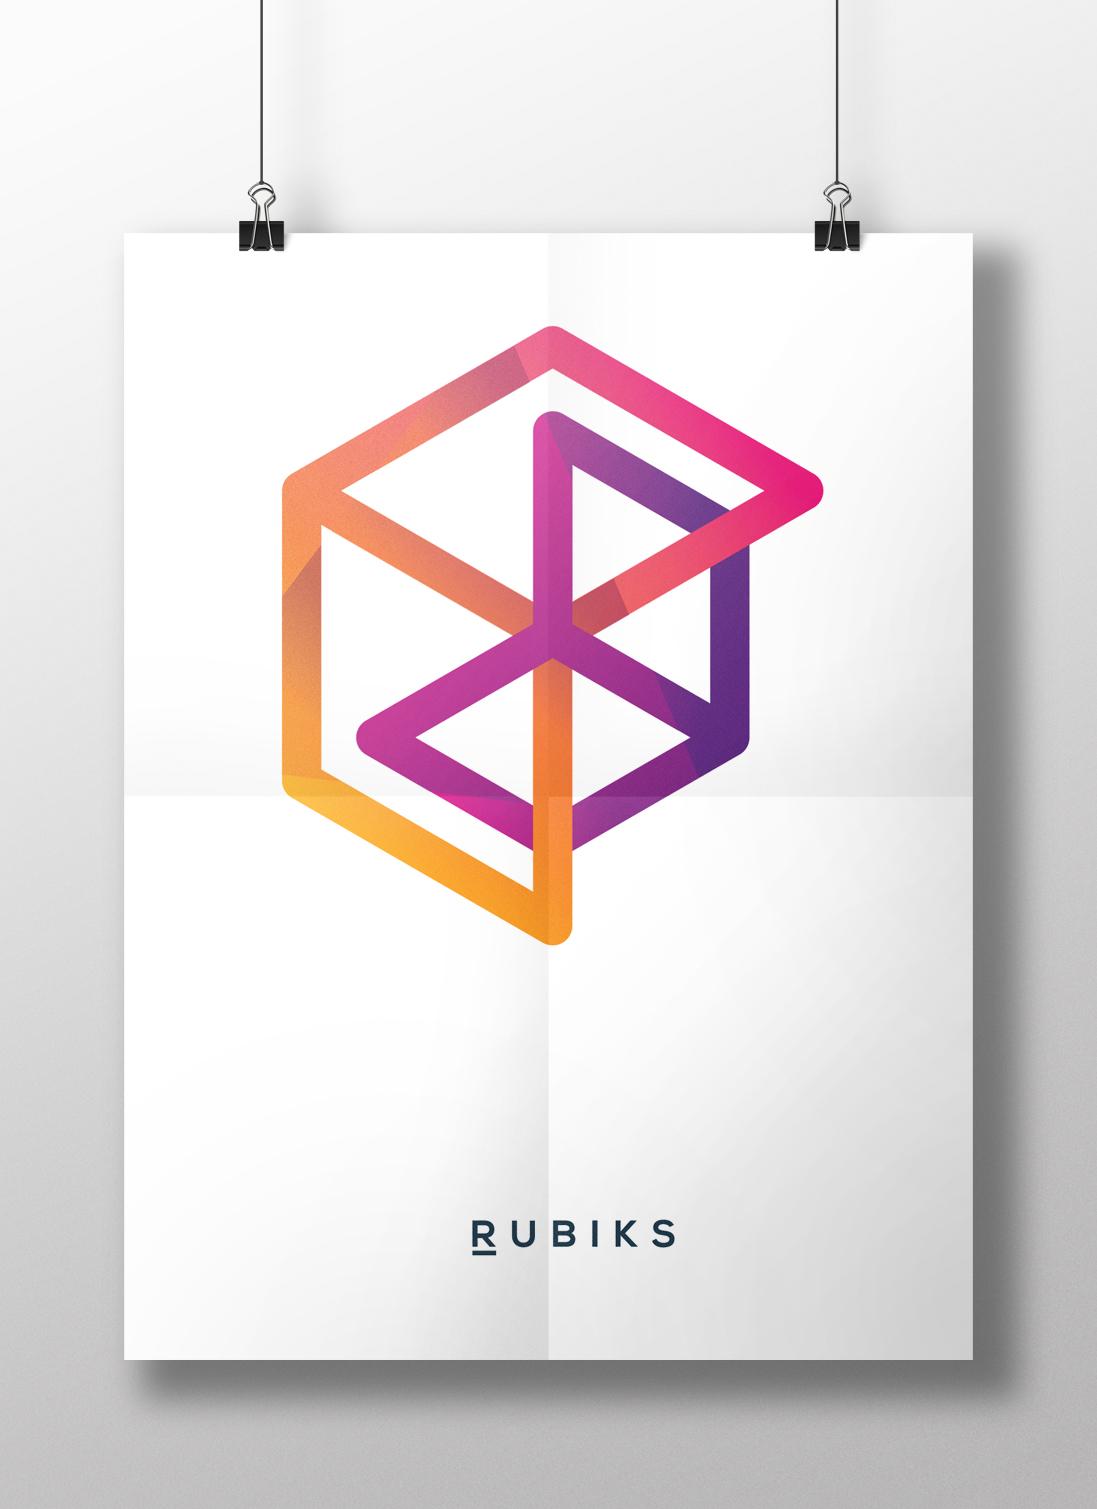 rubiks poster_mockup3